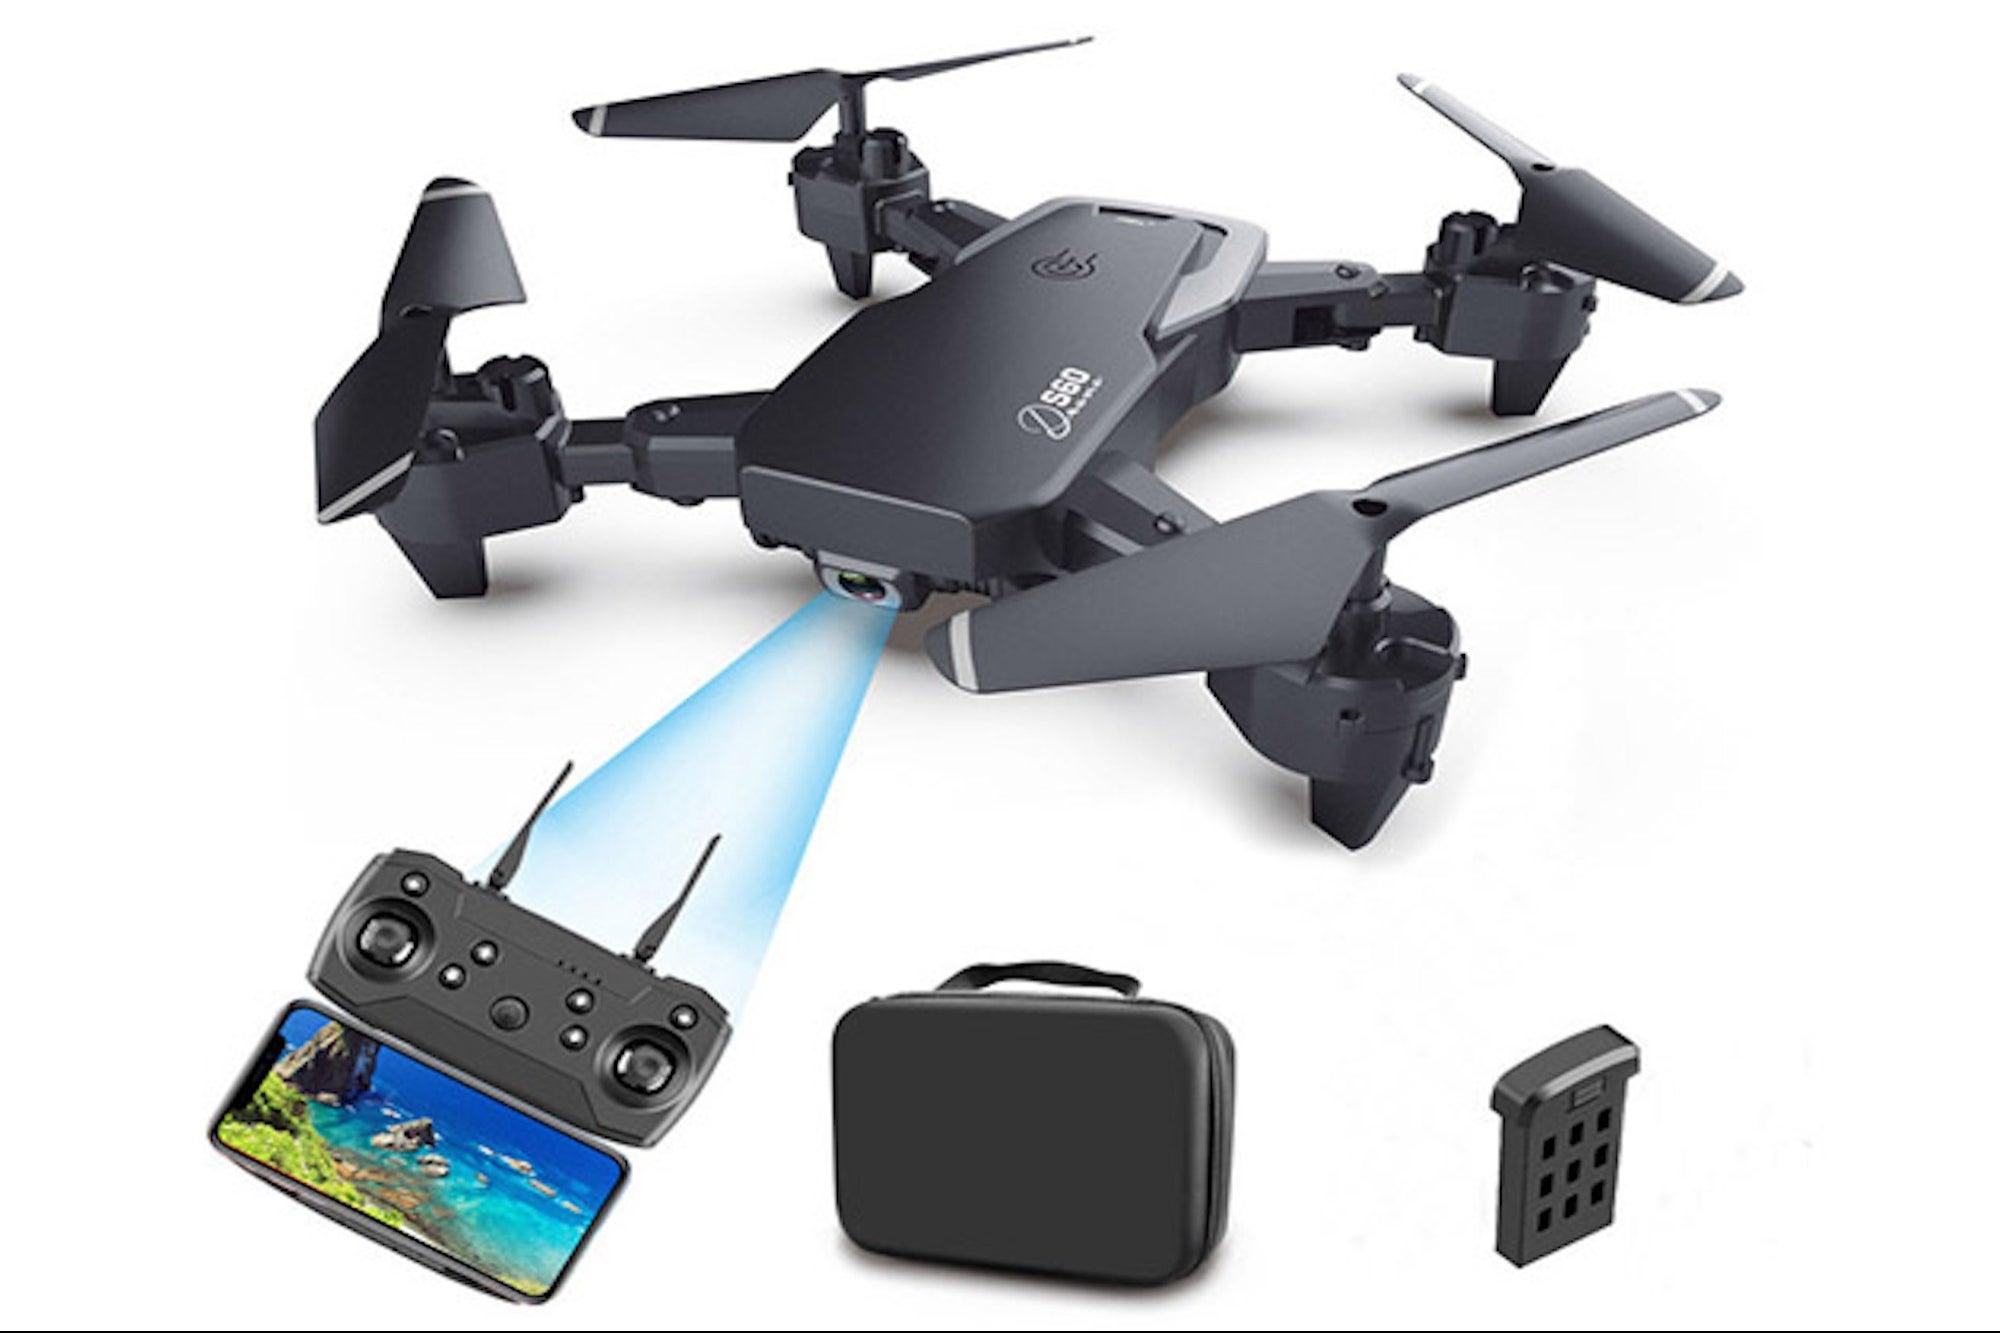 entrepreneur.com - Entrepreneur Store - Get Into Drone Piloting with This Budget-Friendly 4K Drone